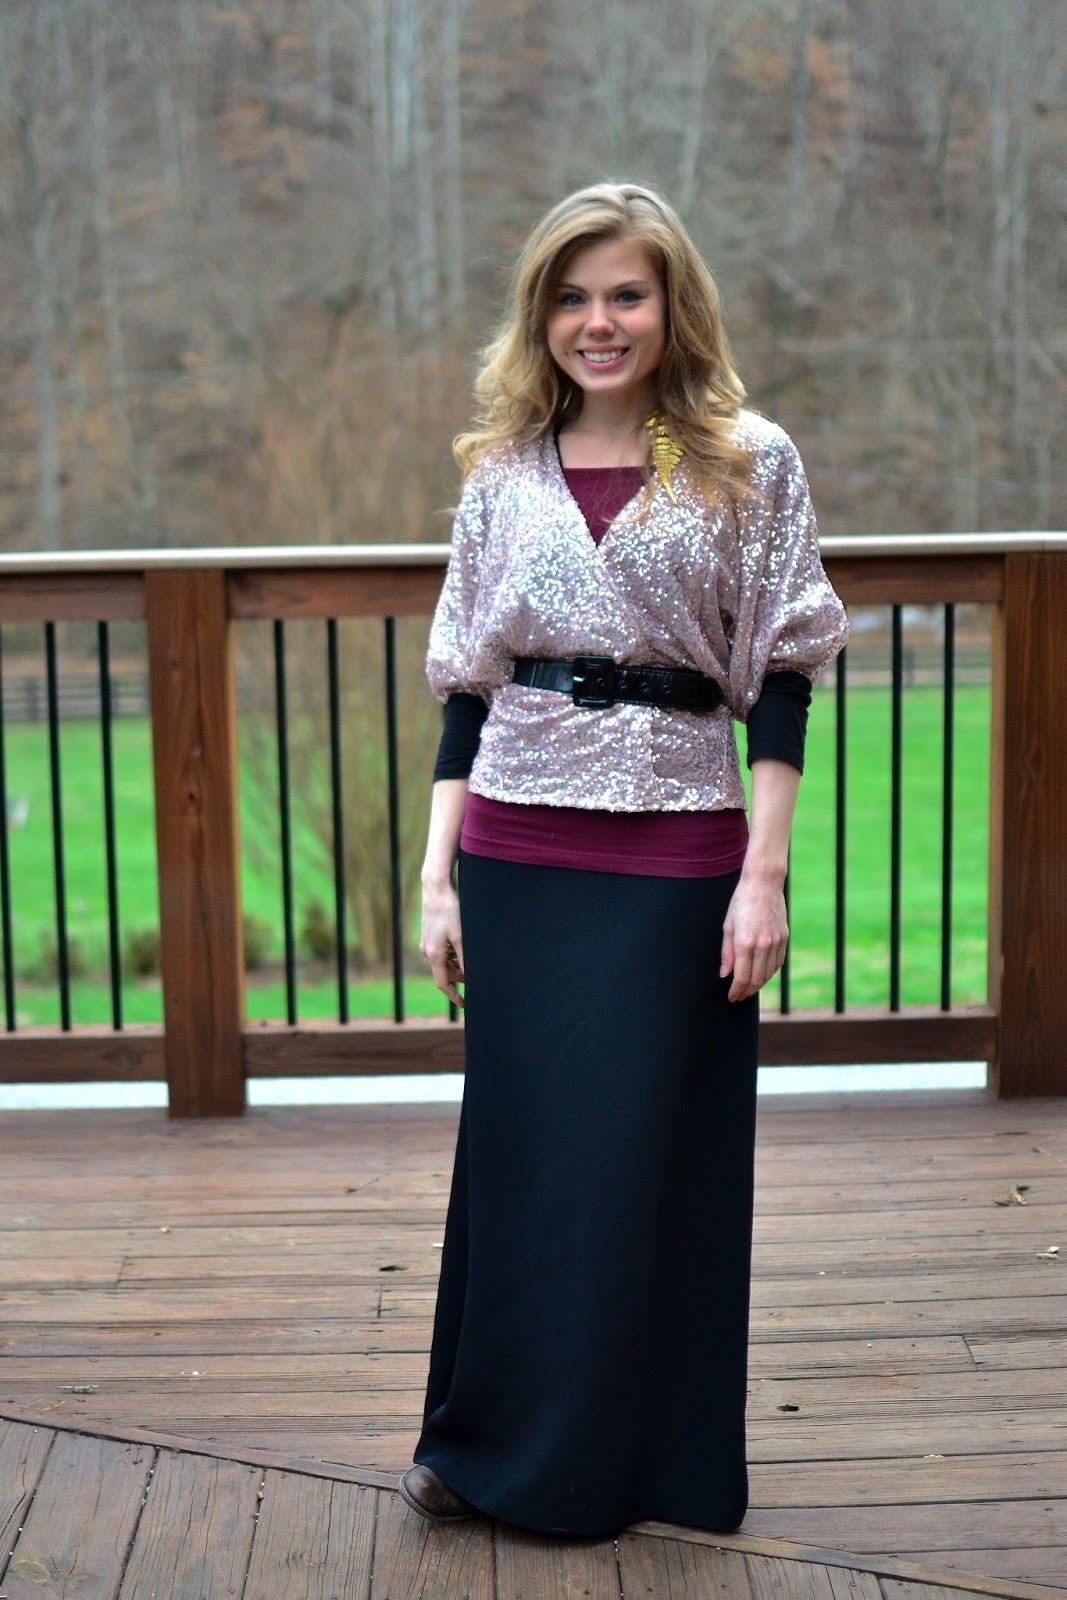 Fresh Modesty: Happy New Year!